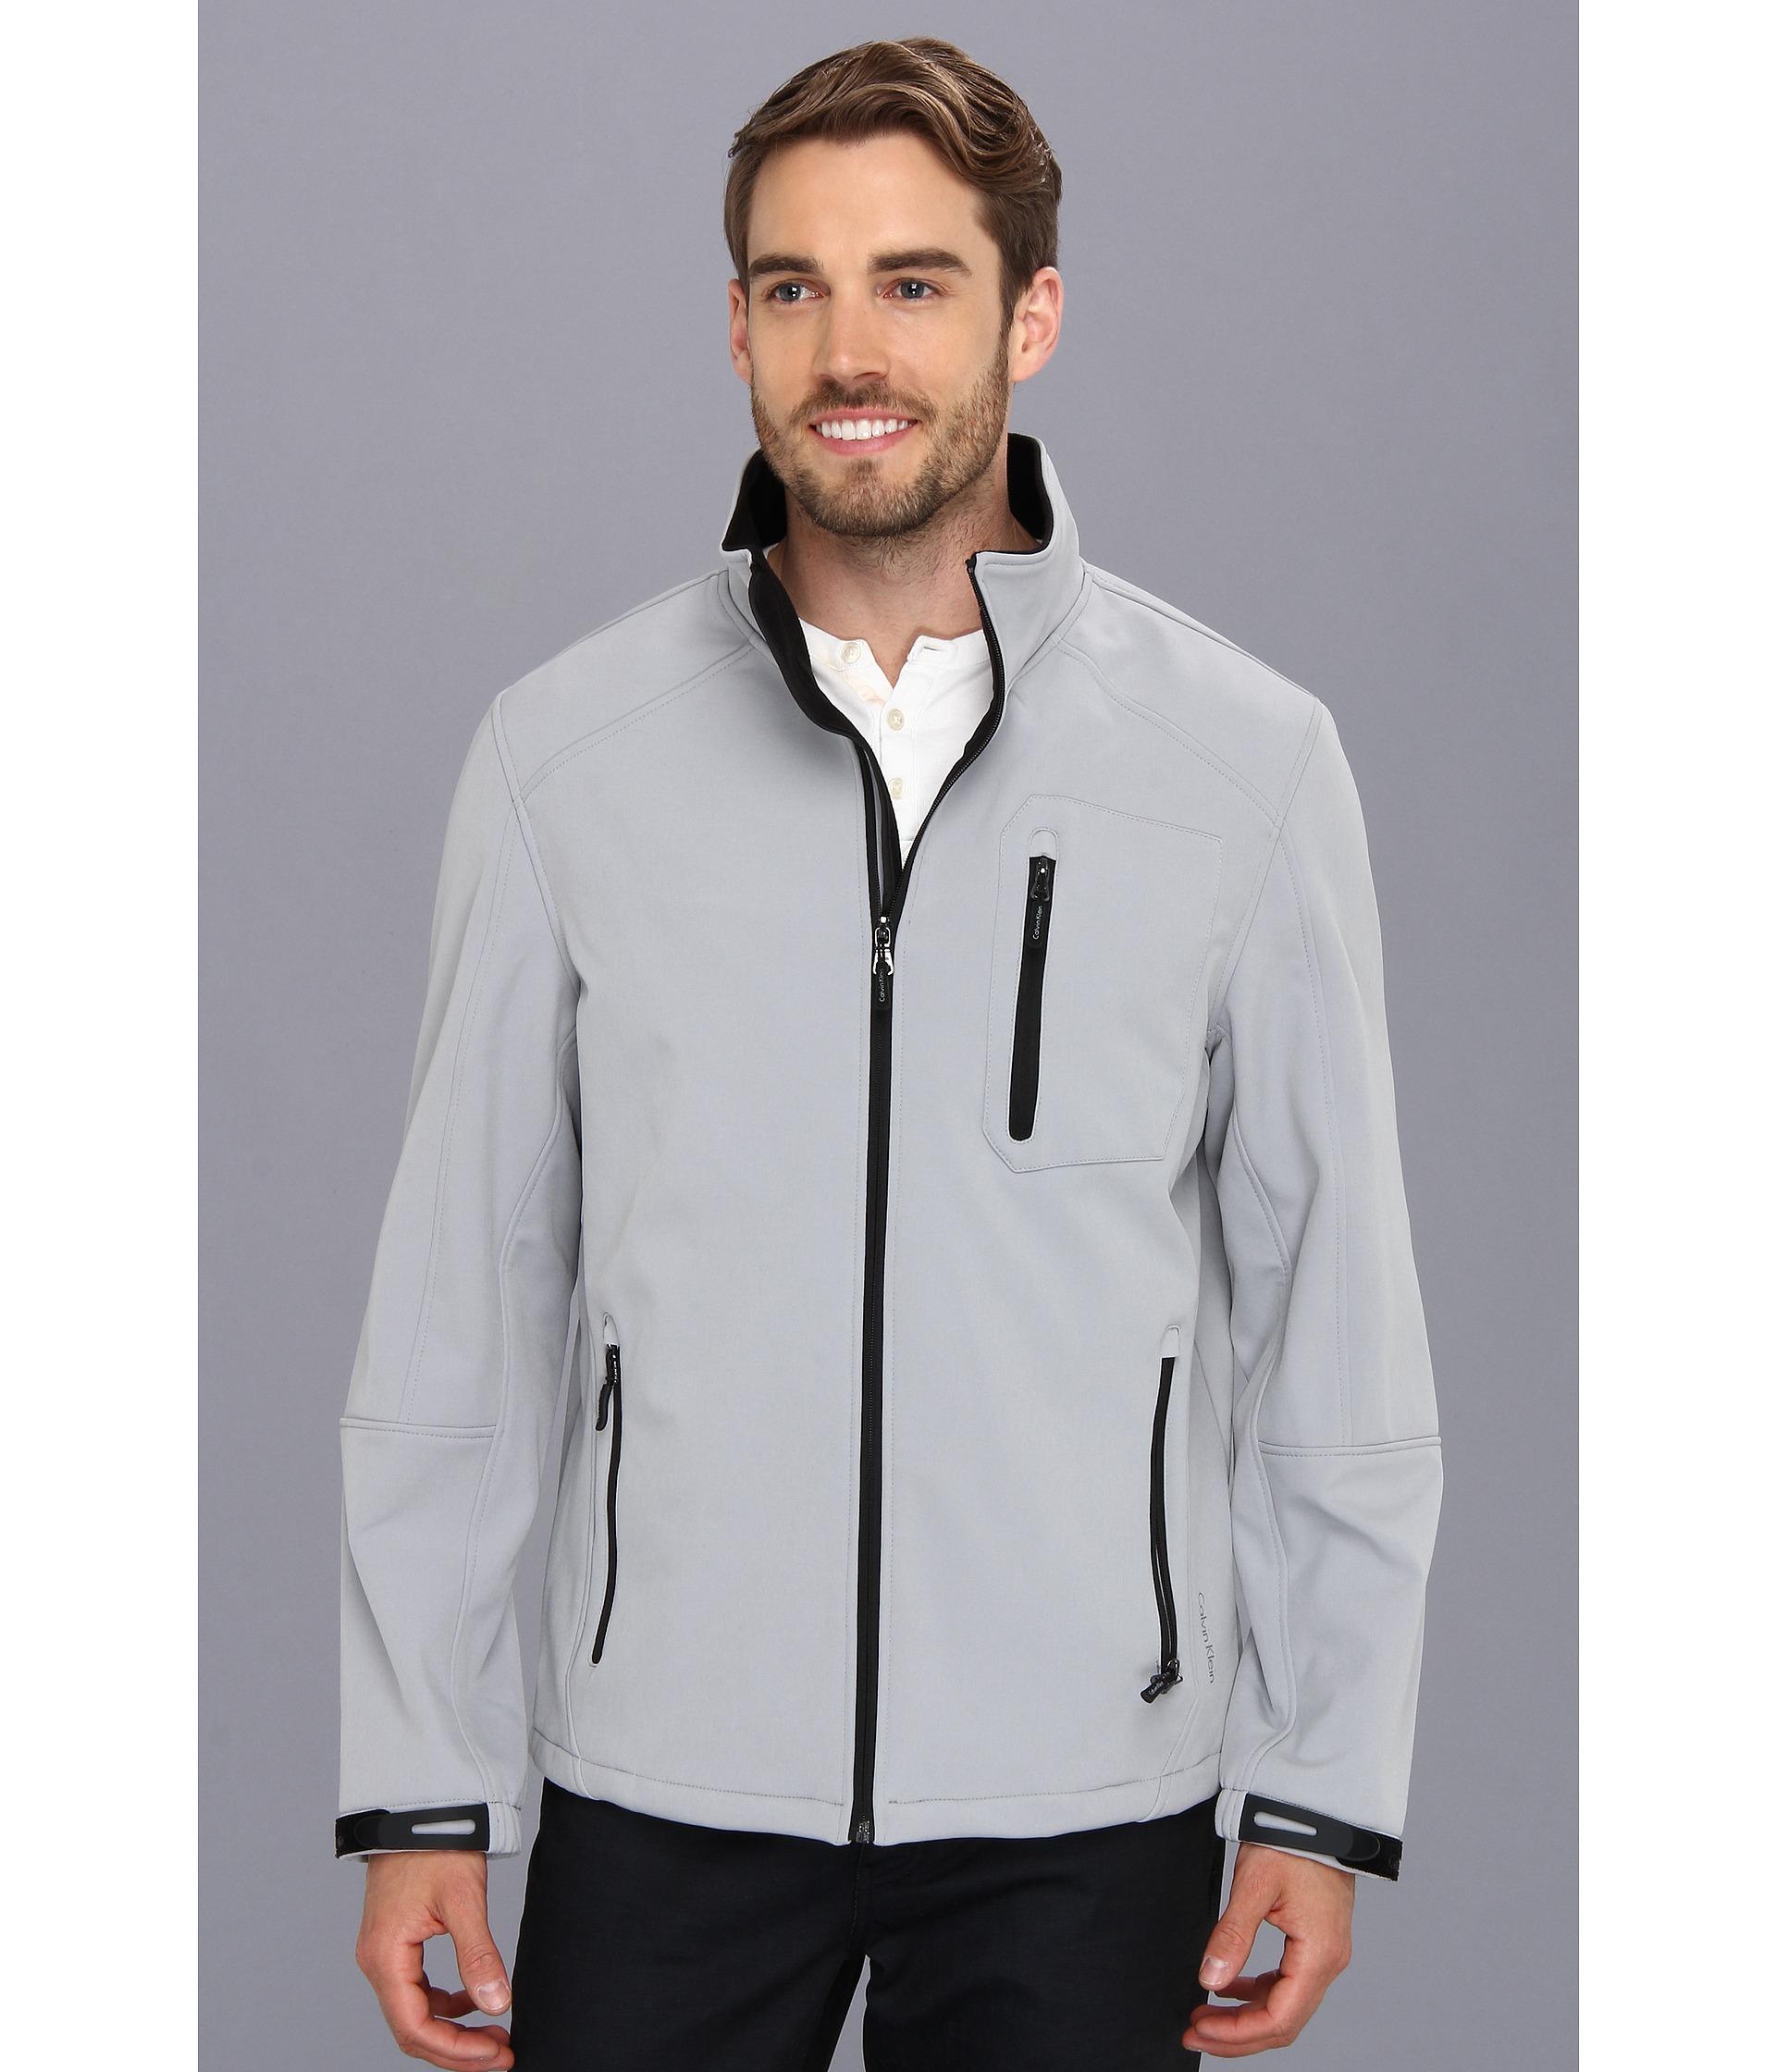 8ec6dec5ad7 Lyst - Calvin Klein Soft Shell Zip Front Jacket in Gray for Men